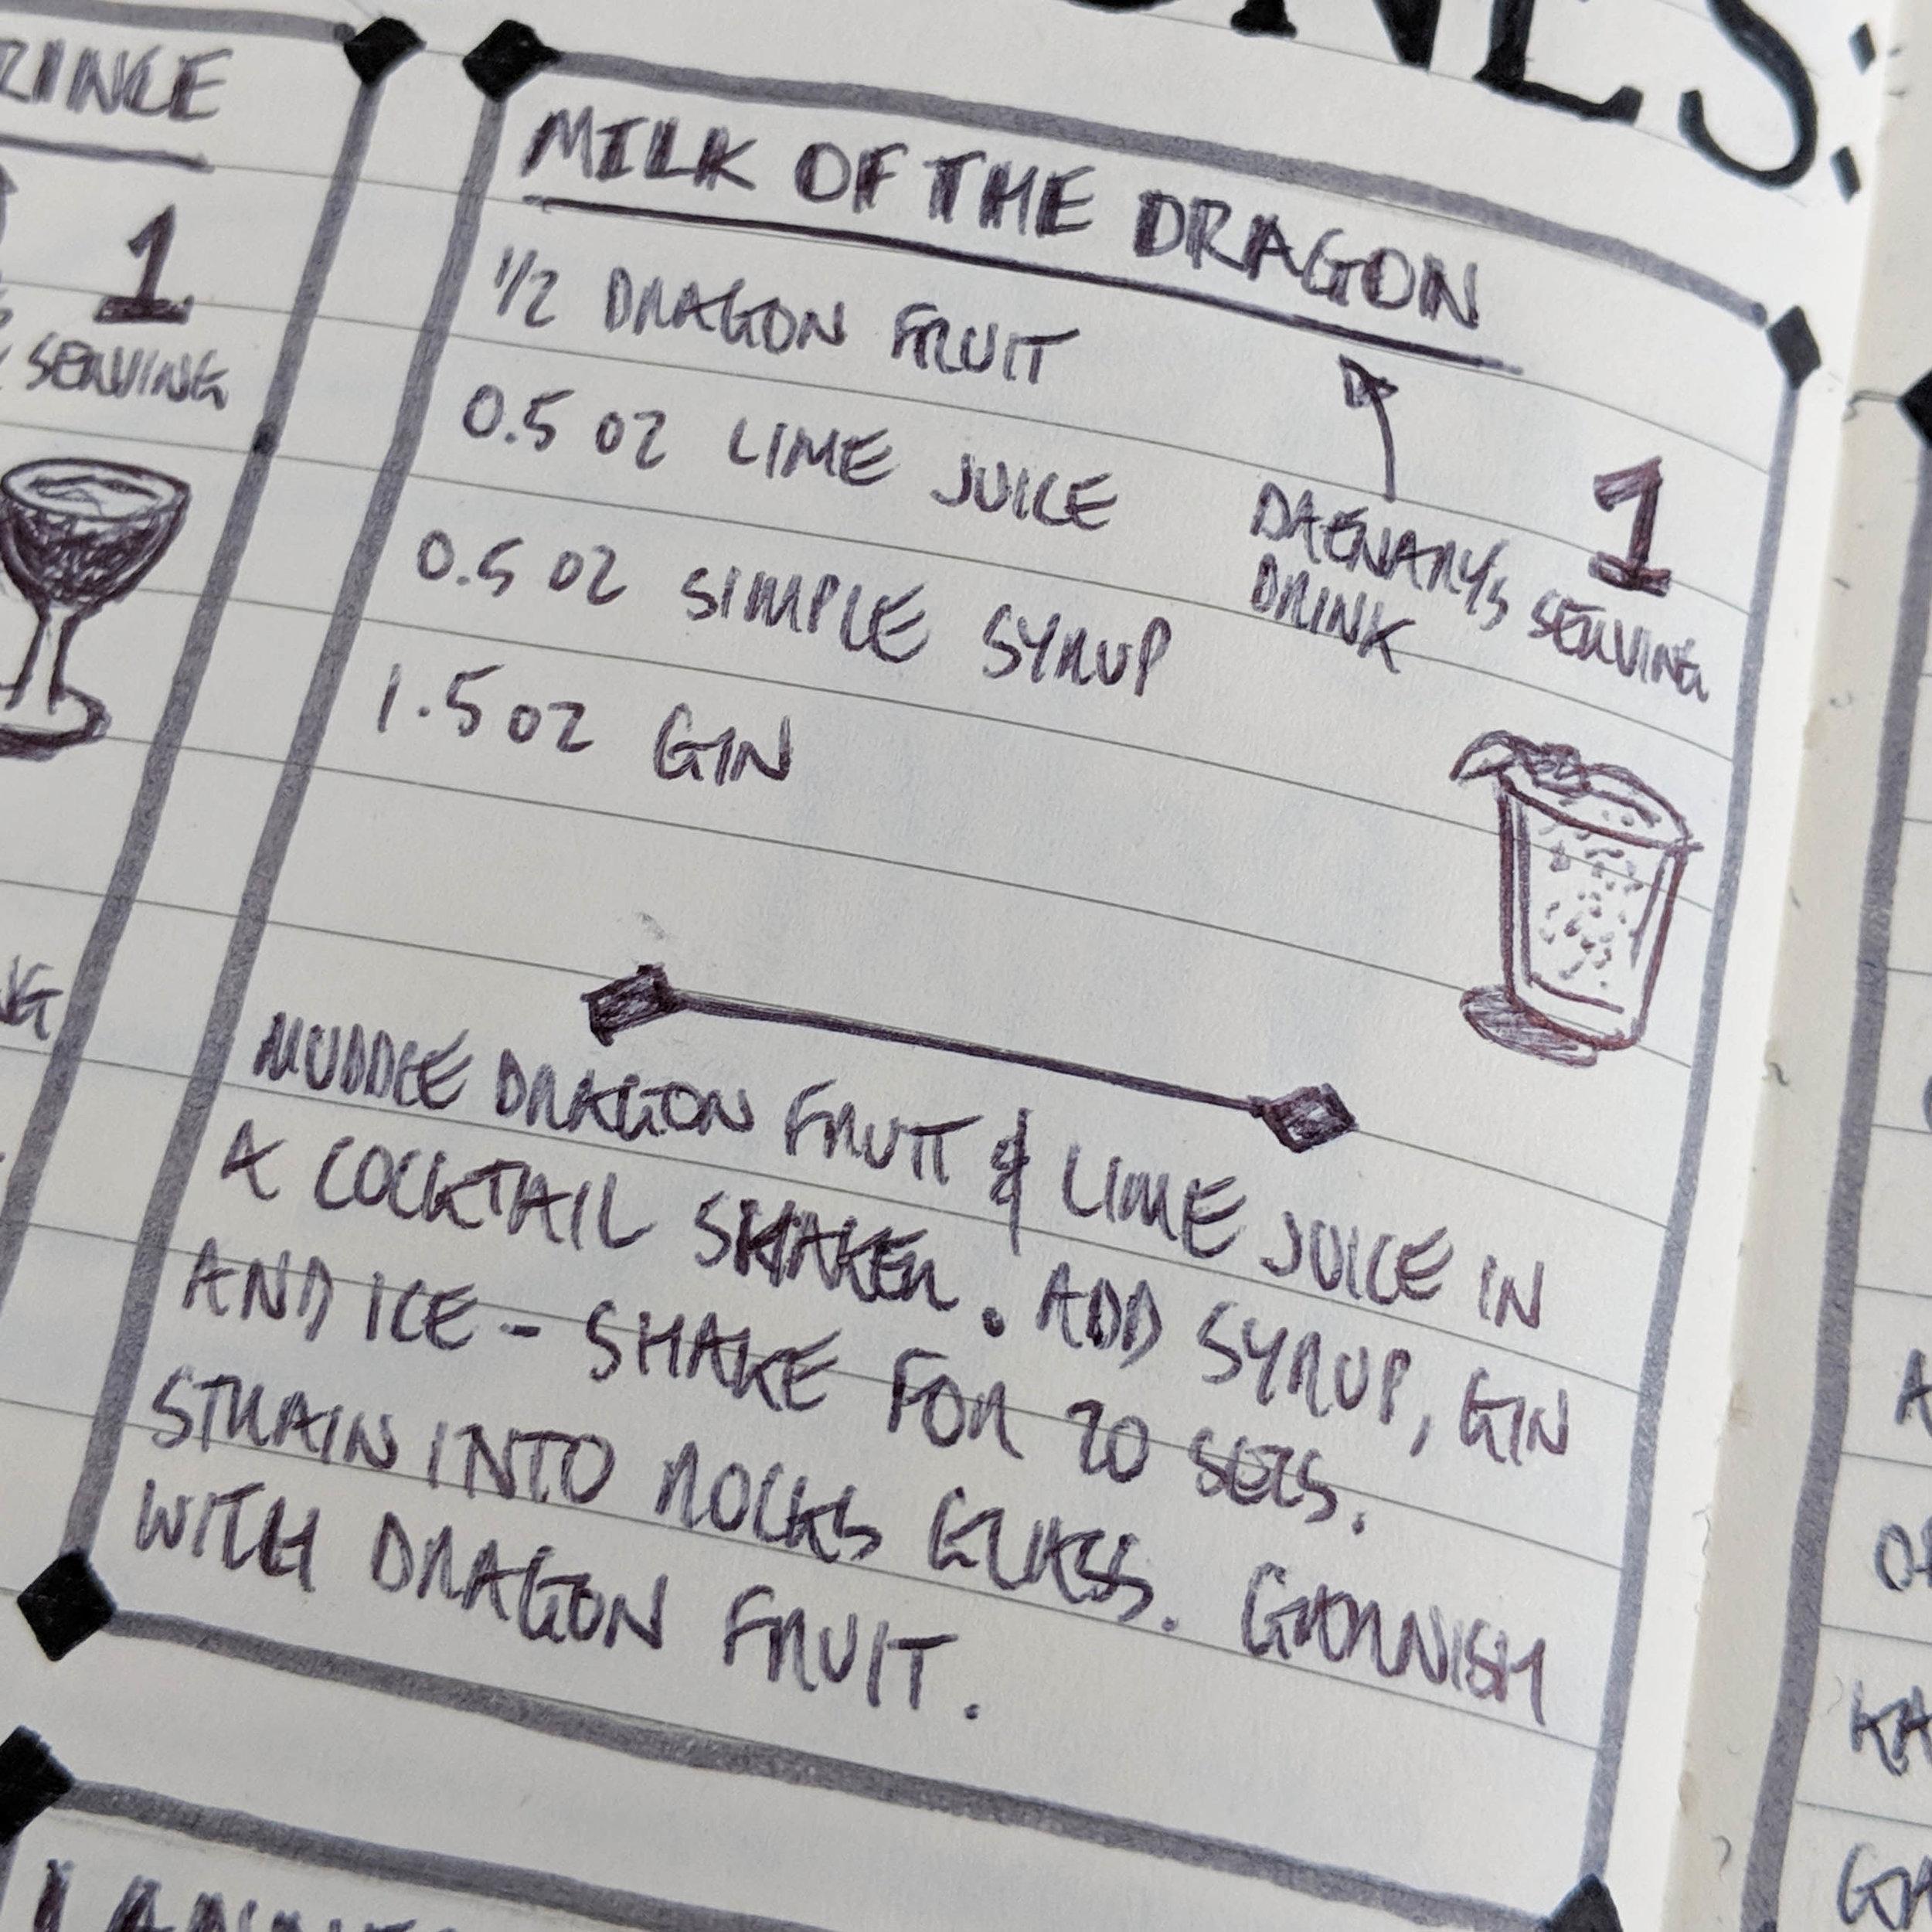 GameofThrones-Cocktails3.jpg